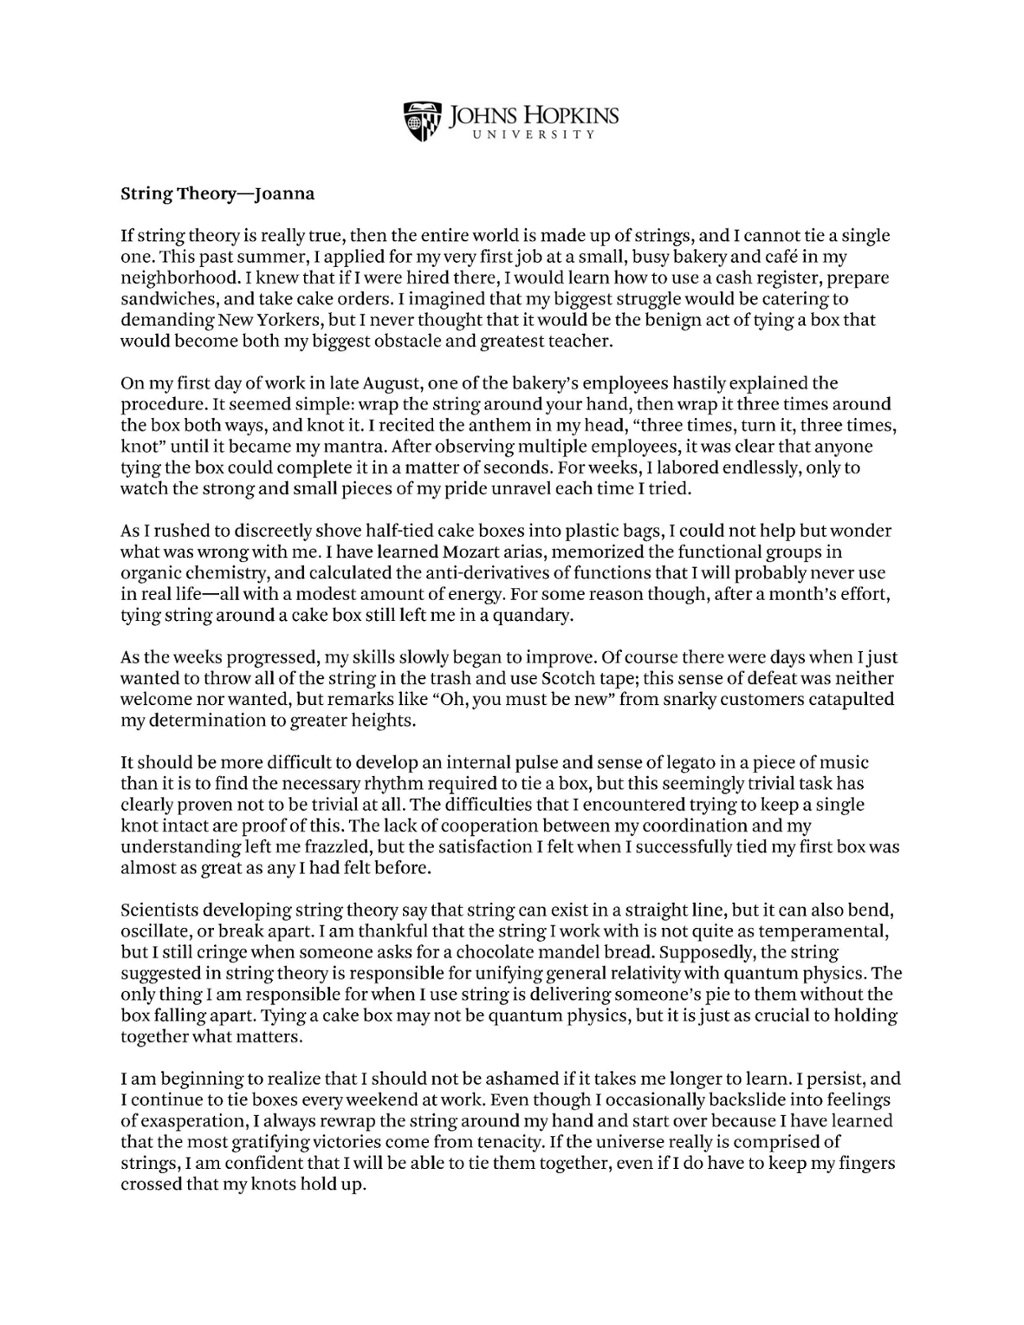 High School Application Essay Sample - Writing Service